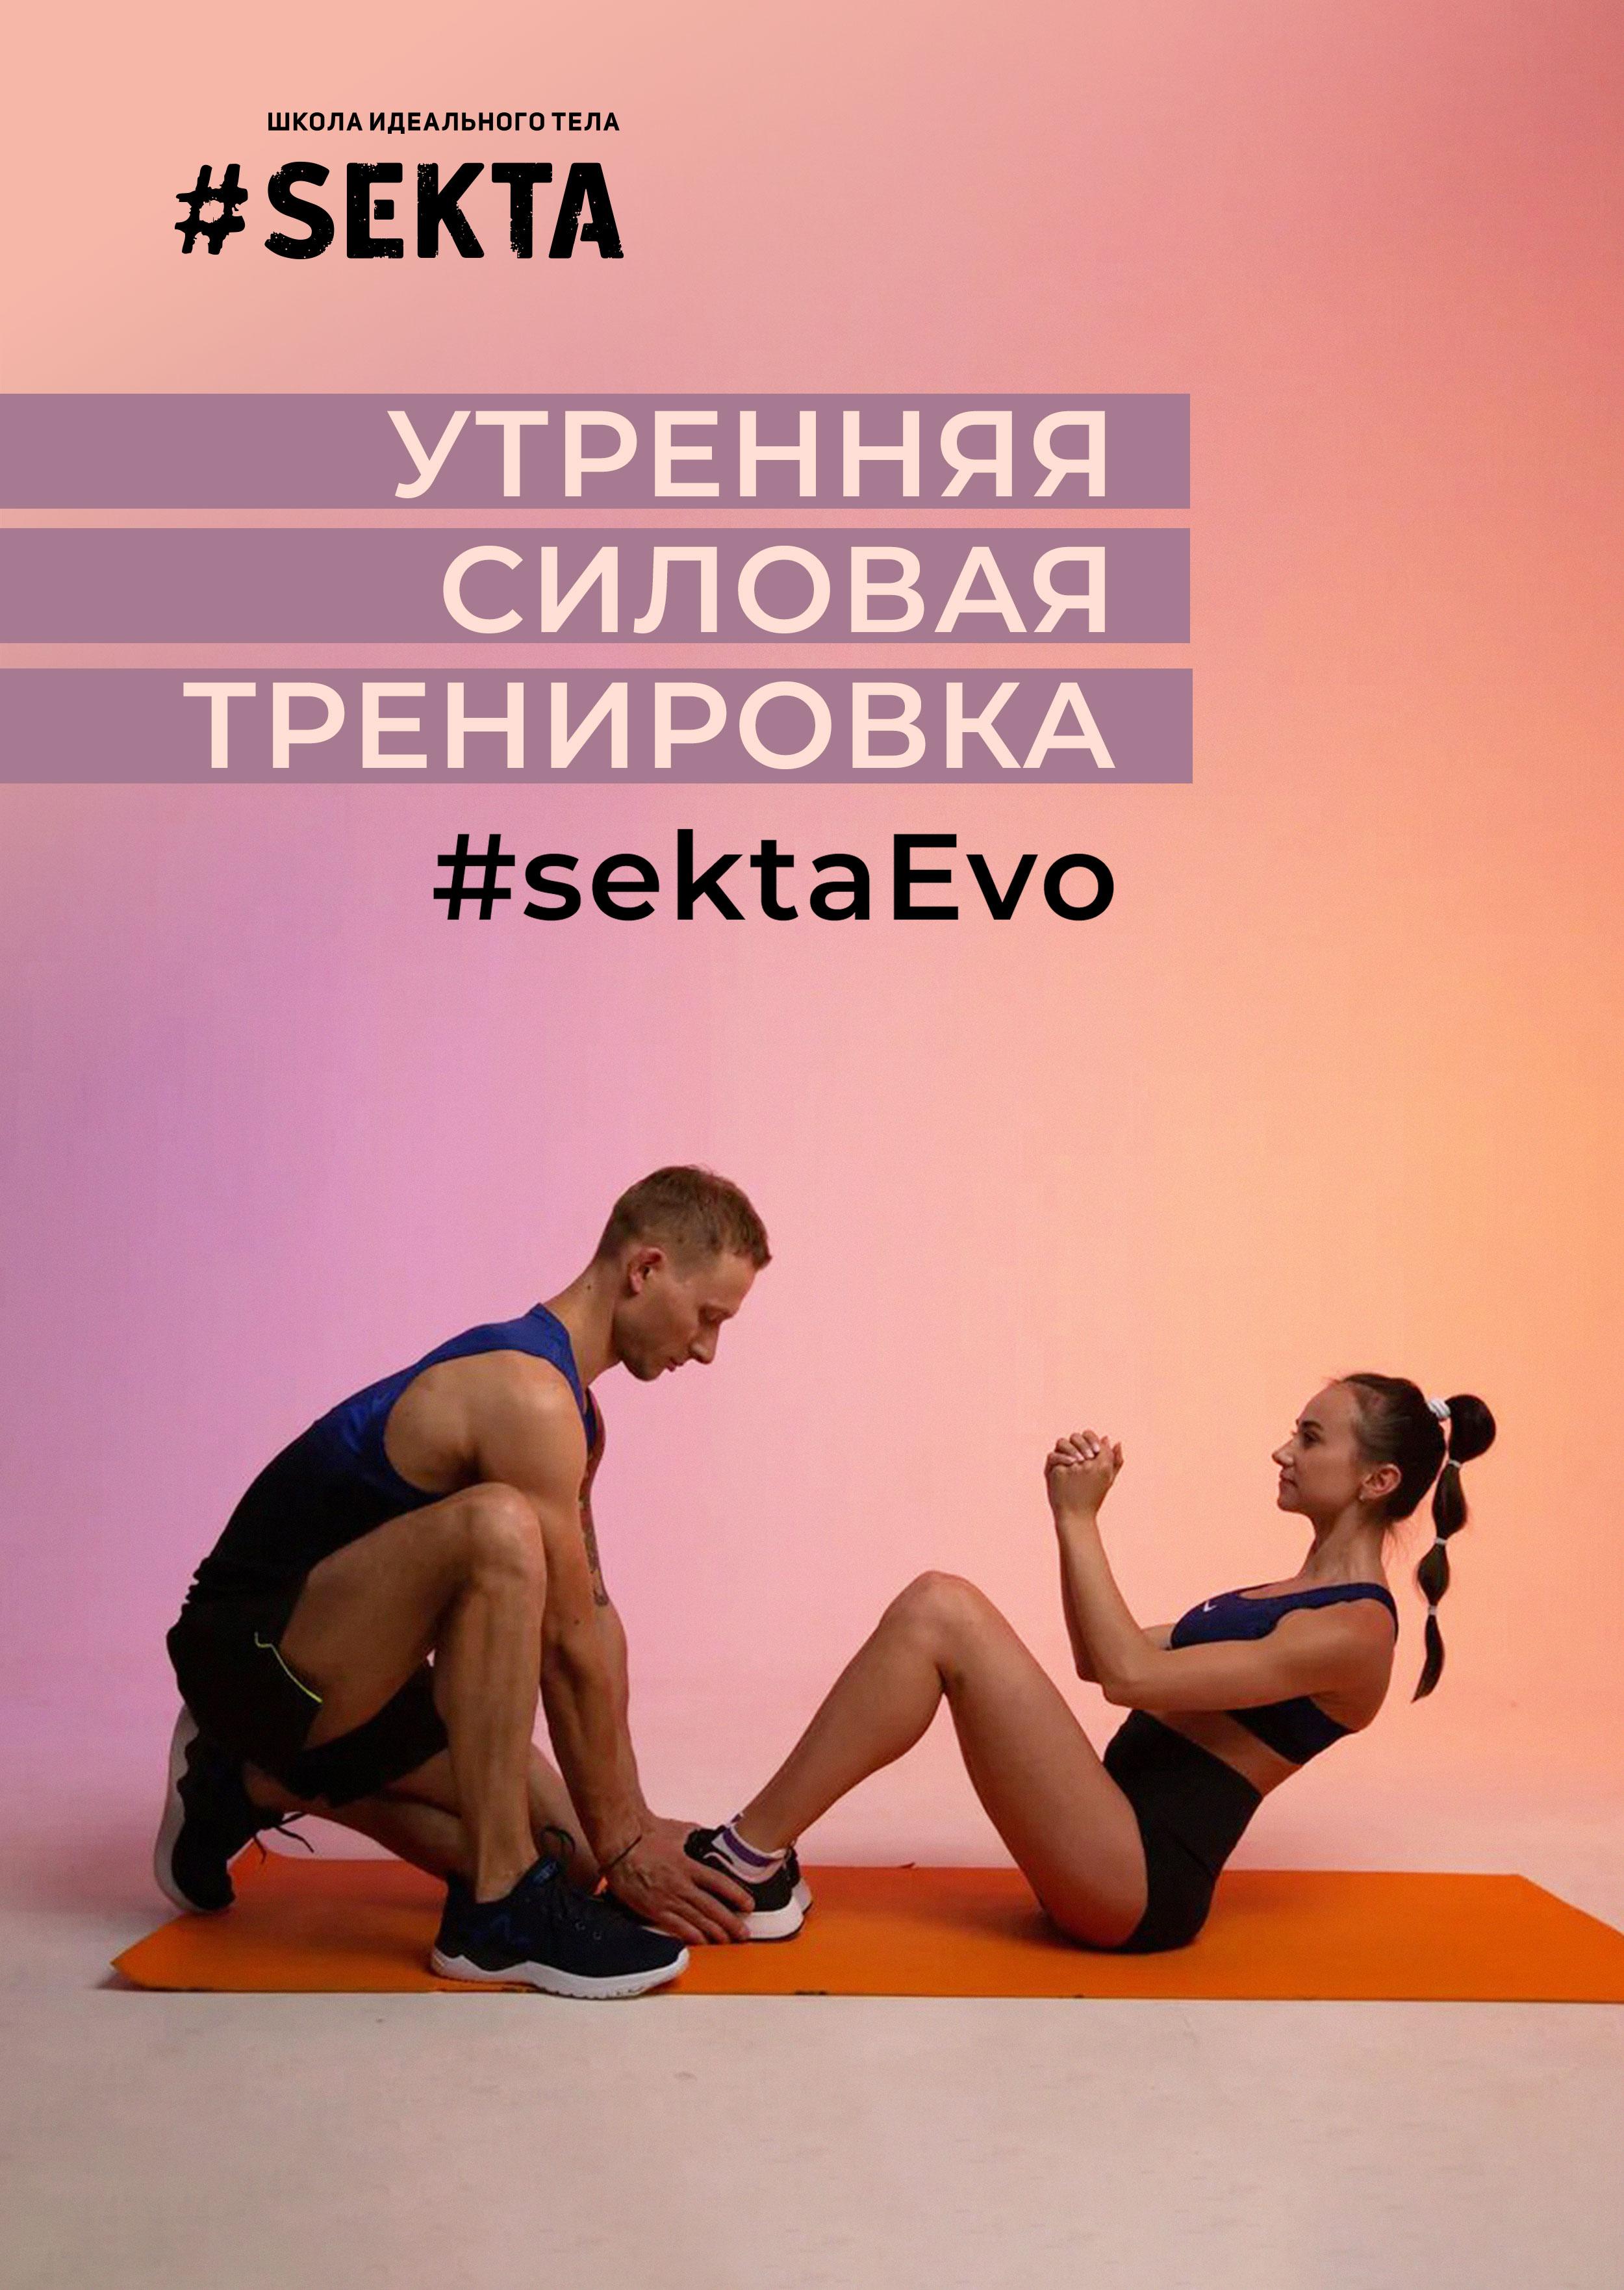 Утренняя силовая тренировка #sektaEvo